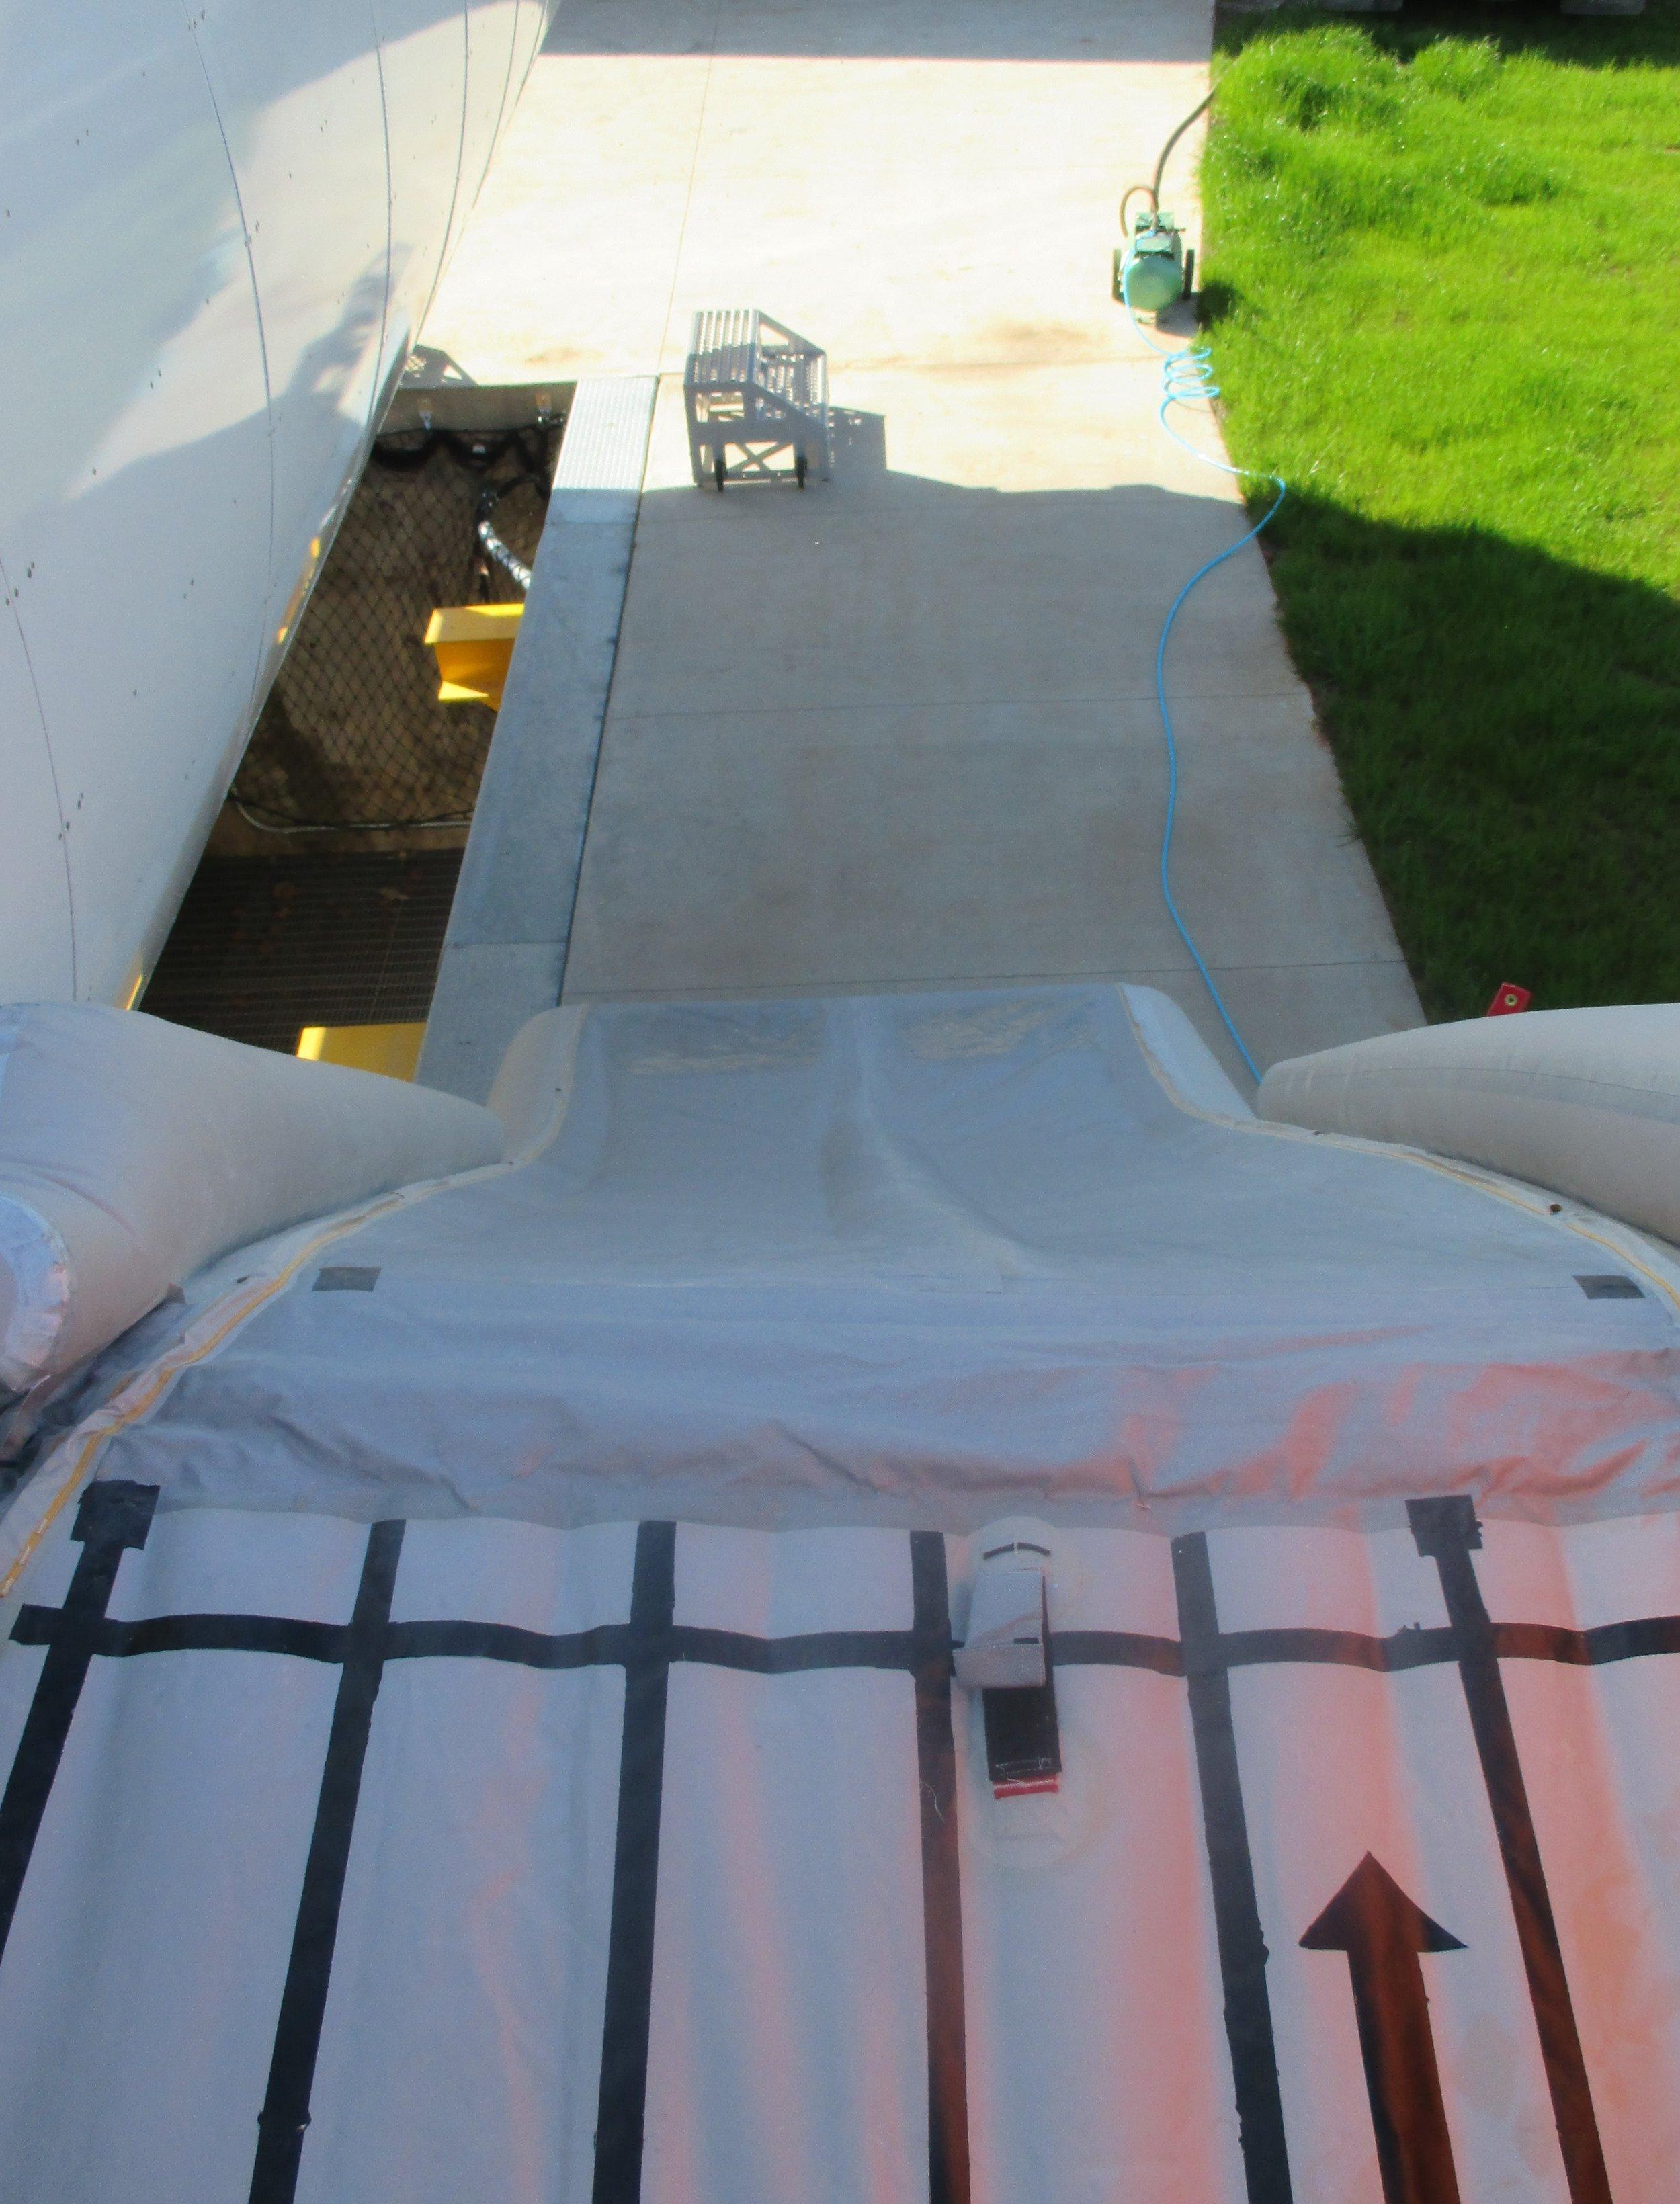 Wing Evacuation Training Slide